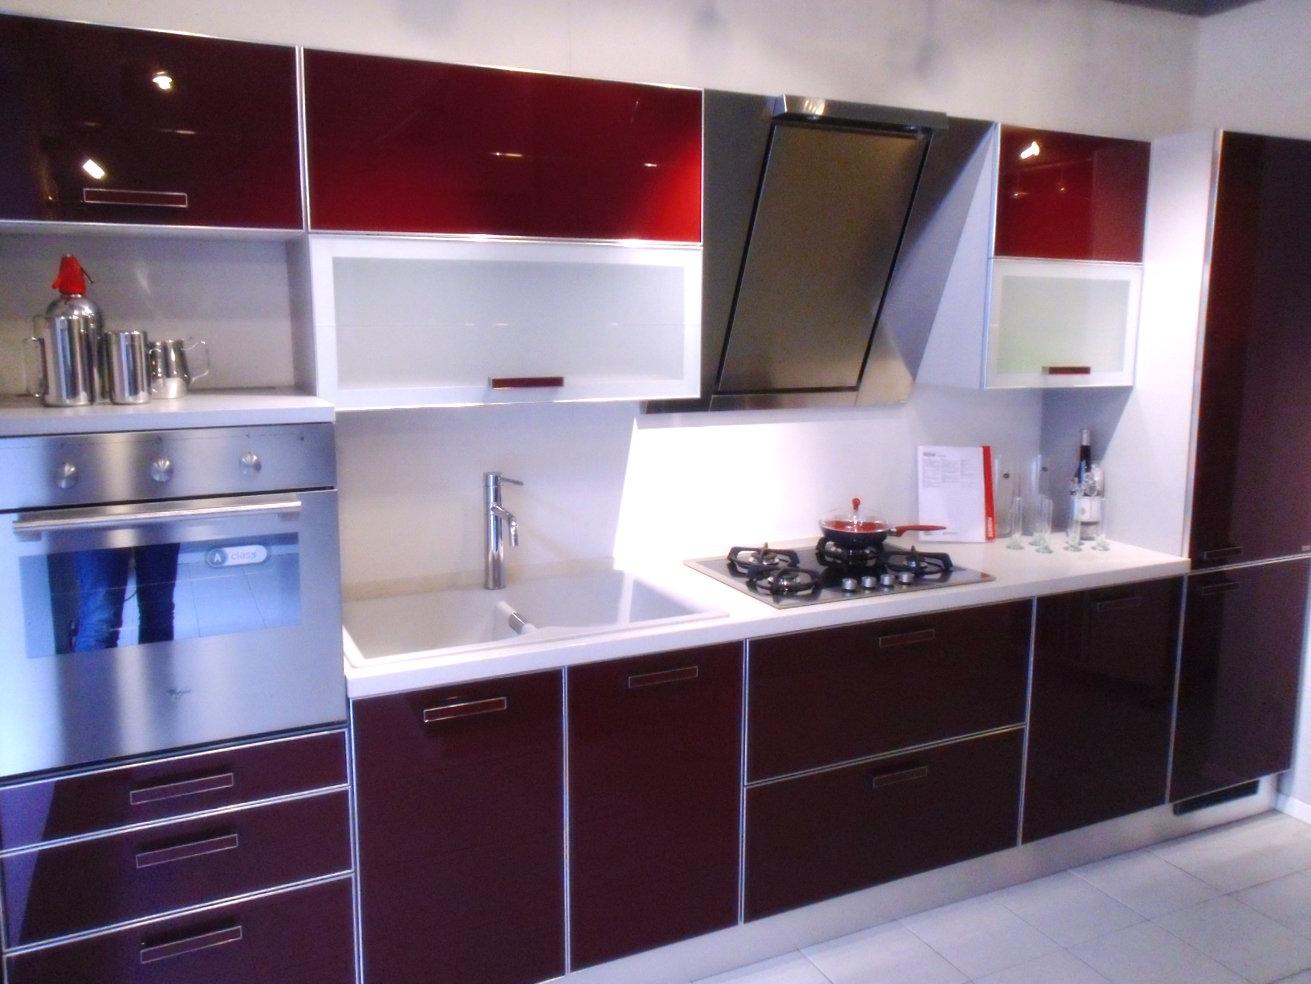 Emejing Cucina Scavolini Rossa Gallery - Ideas & Design 2017 ...